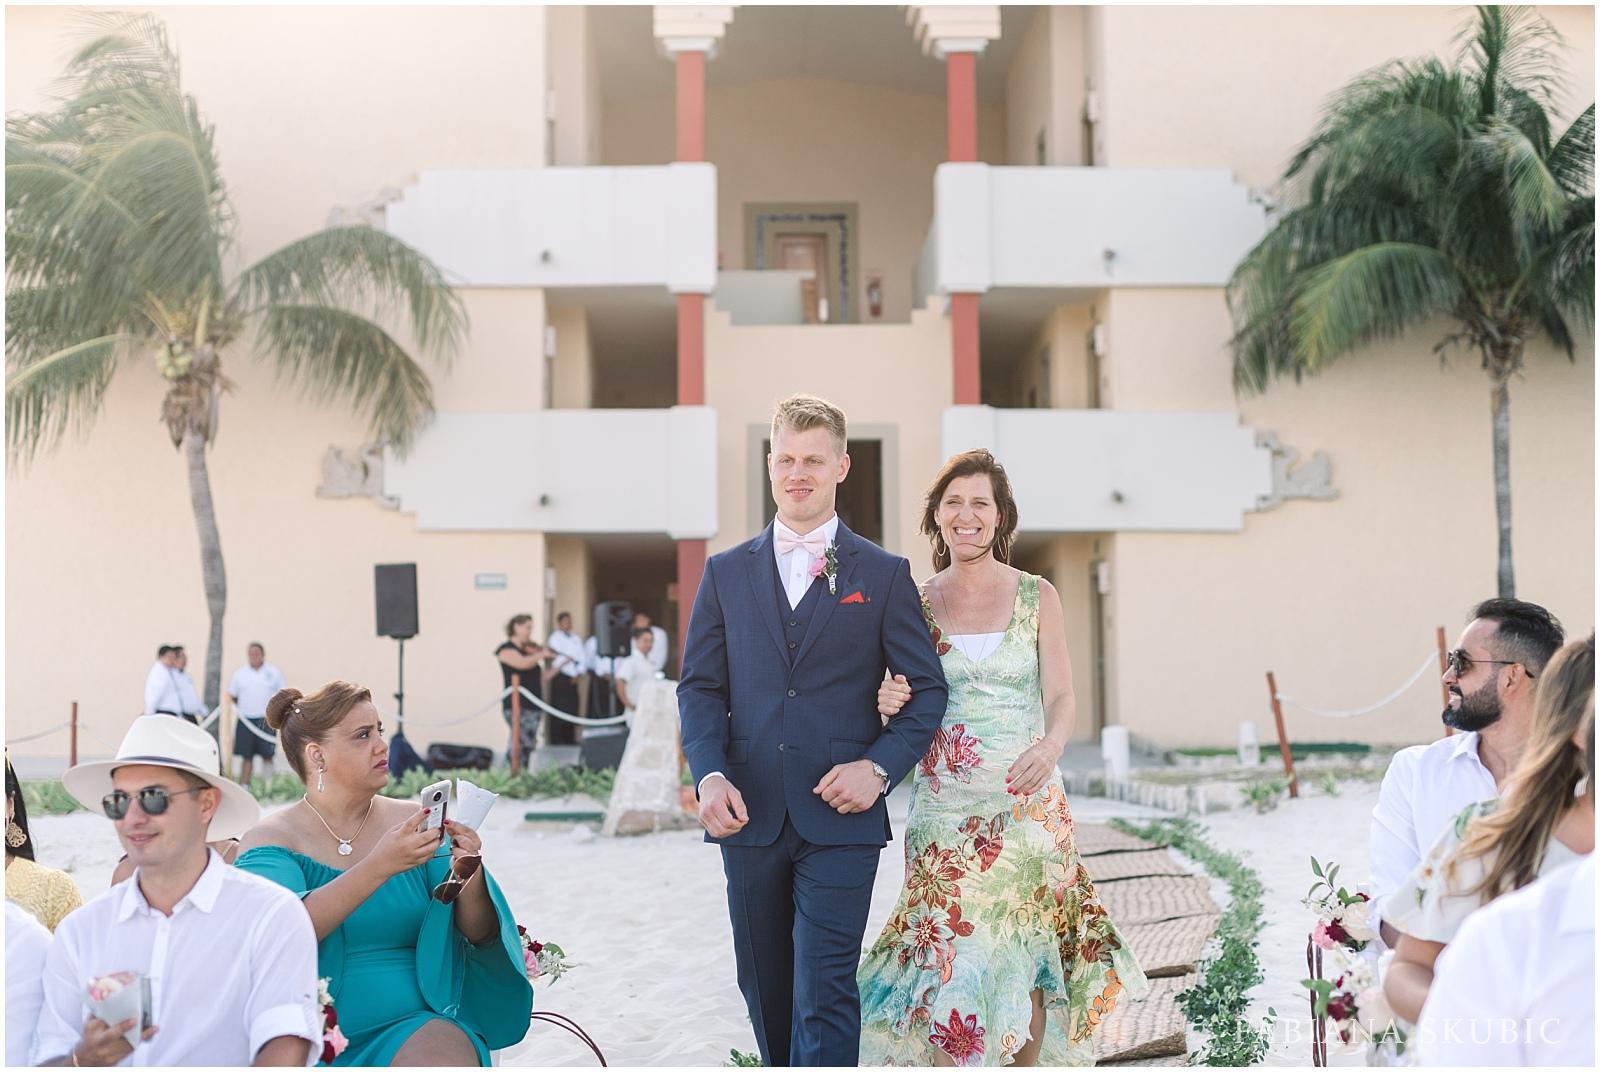 TJ_Now_Sapphire_Riviera_Cancun_Mexico_Wedding_Photos_0225.jpg